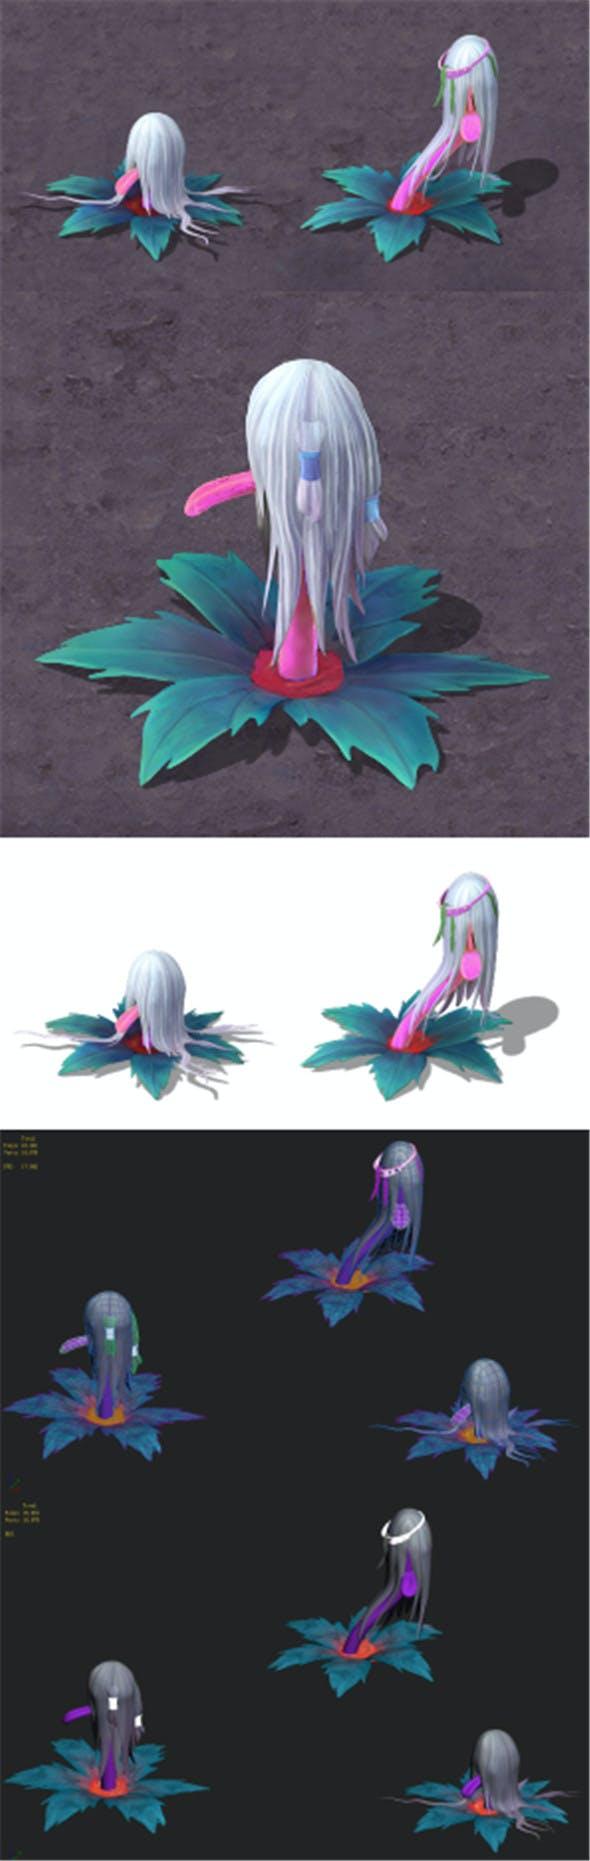 Cartoon hell - water ghost lantern - 3DOcean Item for Sale